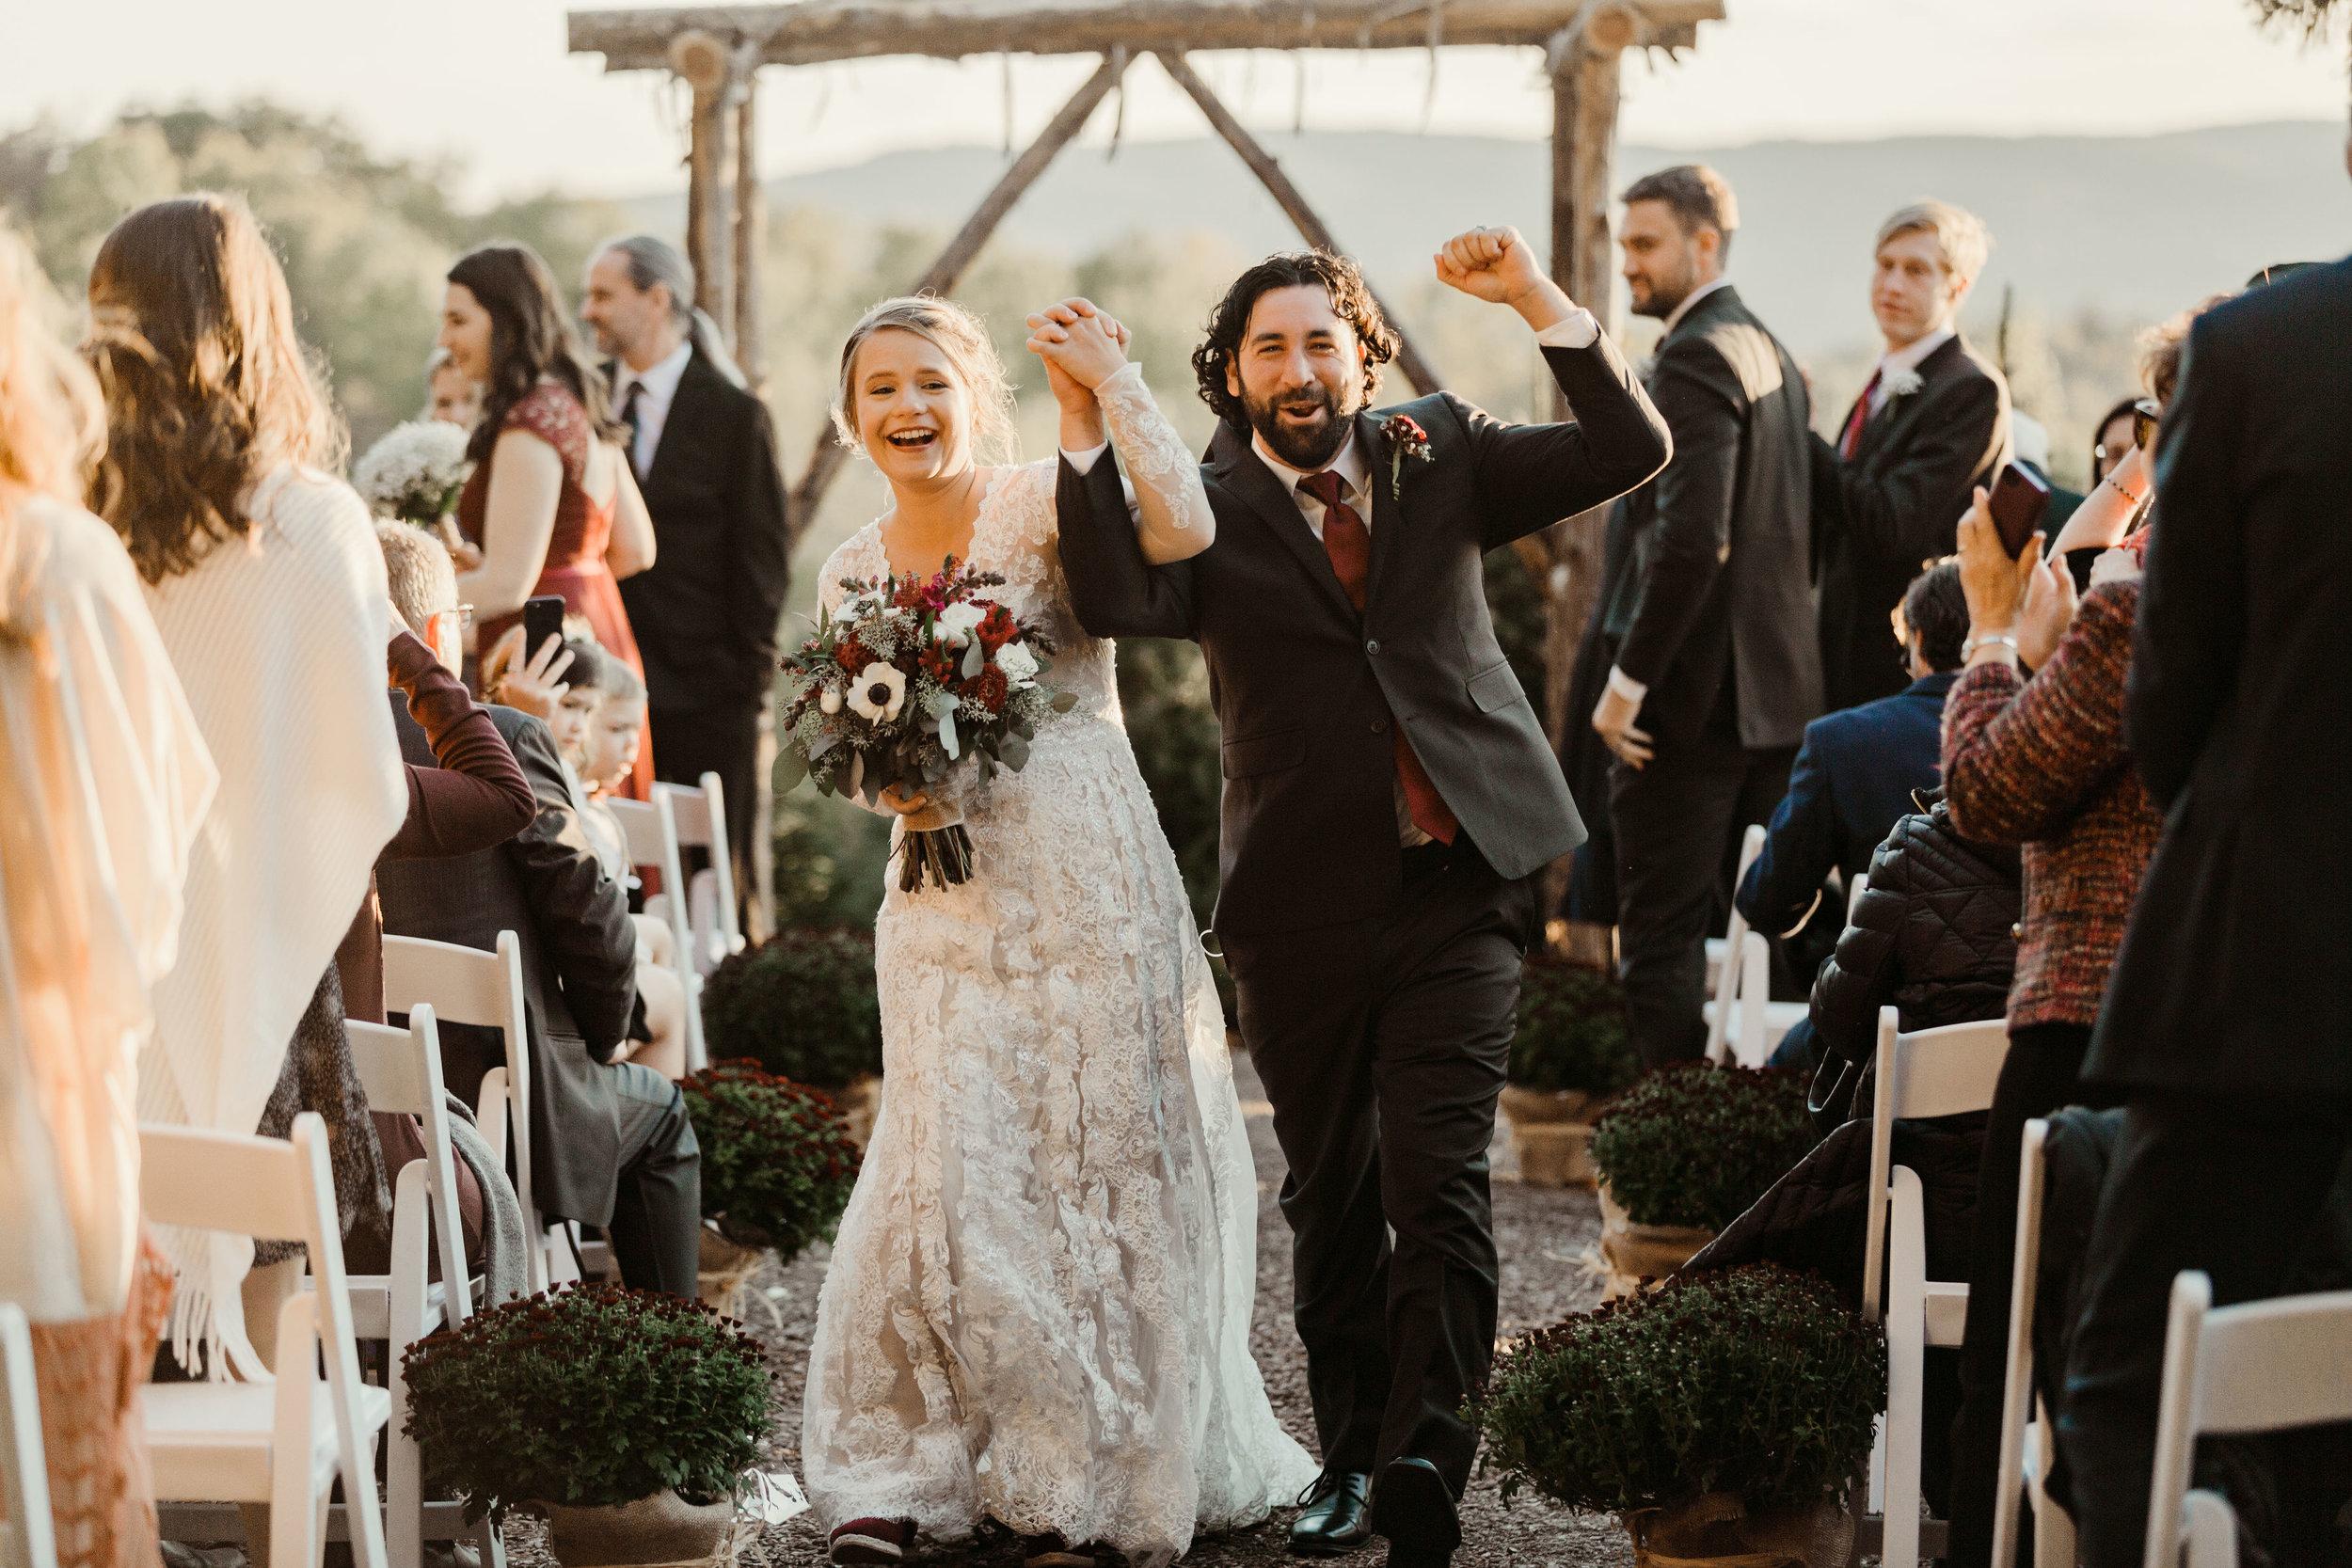 young-love-media-rustic-fall-autumn-wedding-emmerich-tree-farm-hudson-valley-warwick-new-york-ceremony-237.jpg